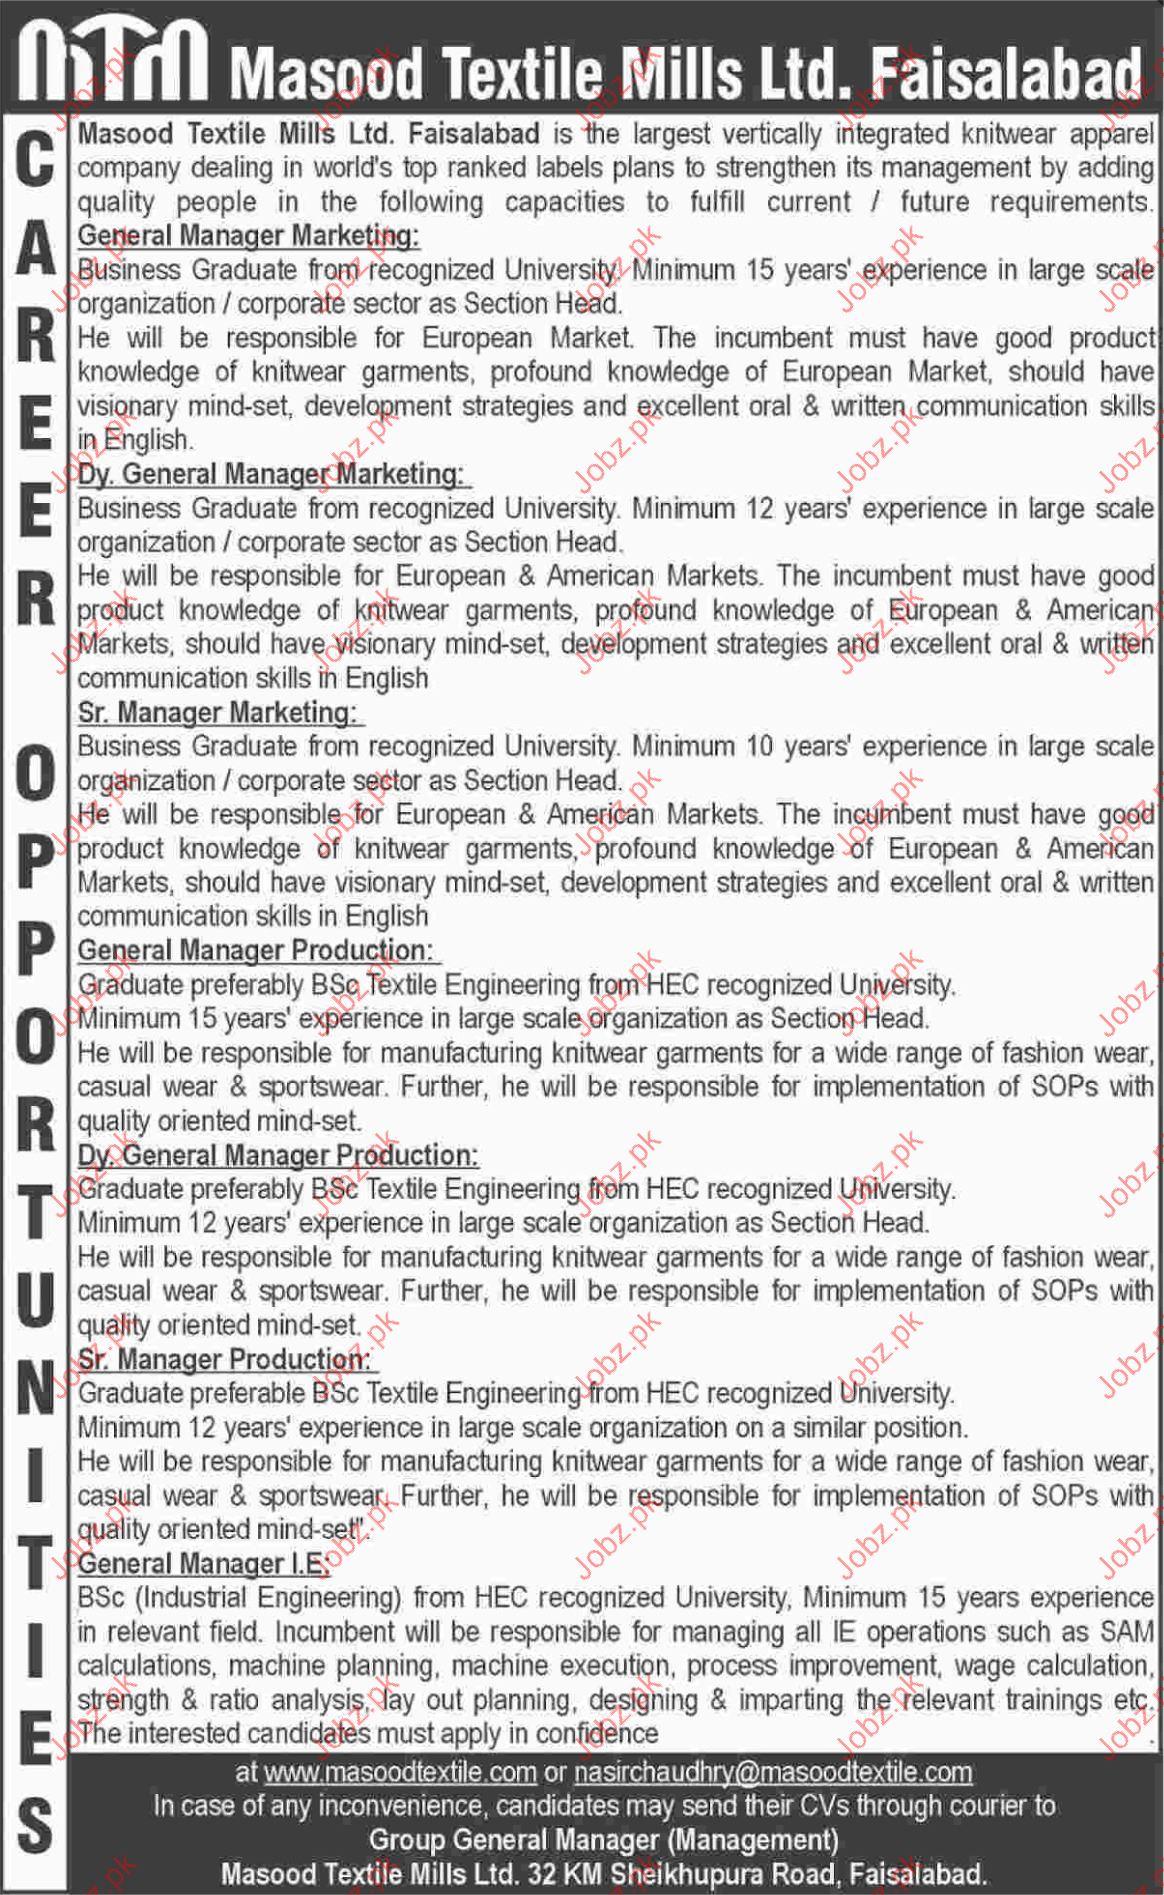 Masood Textile Mills Ltd Job Opportunity